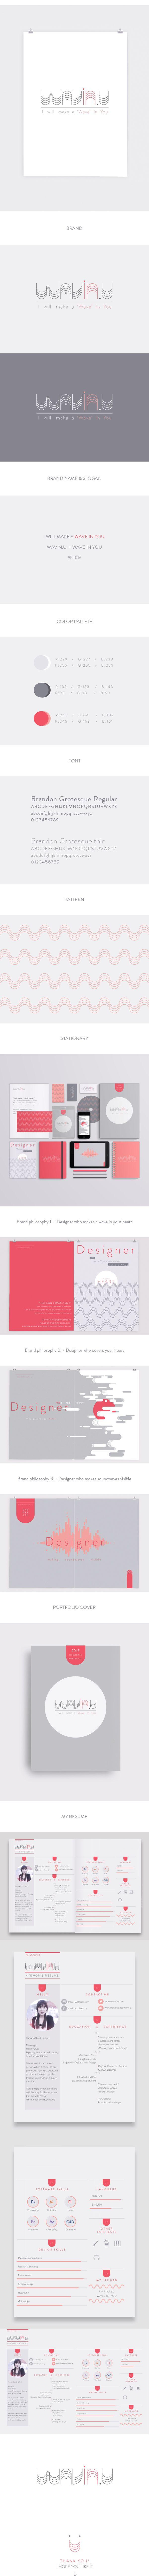 Self branding / resume - CV by Hyewon Shin, via Behance